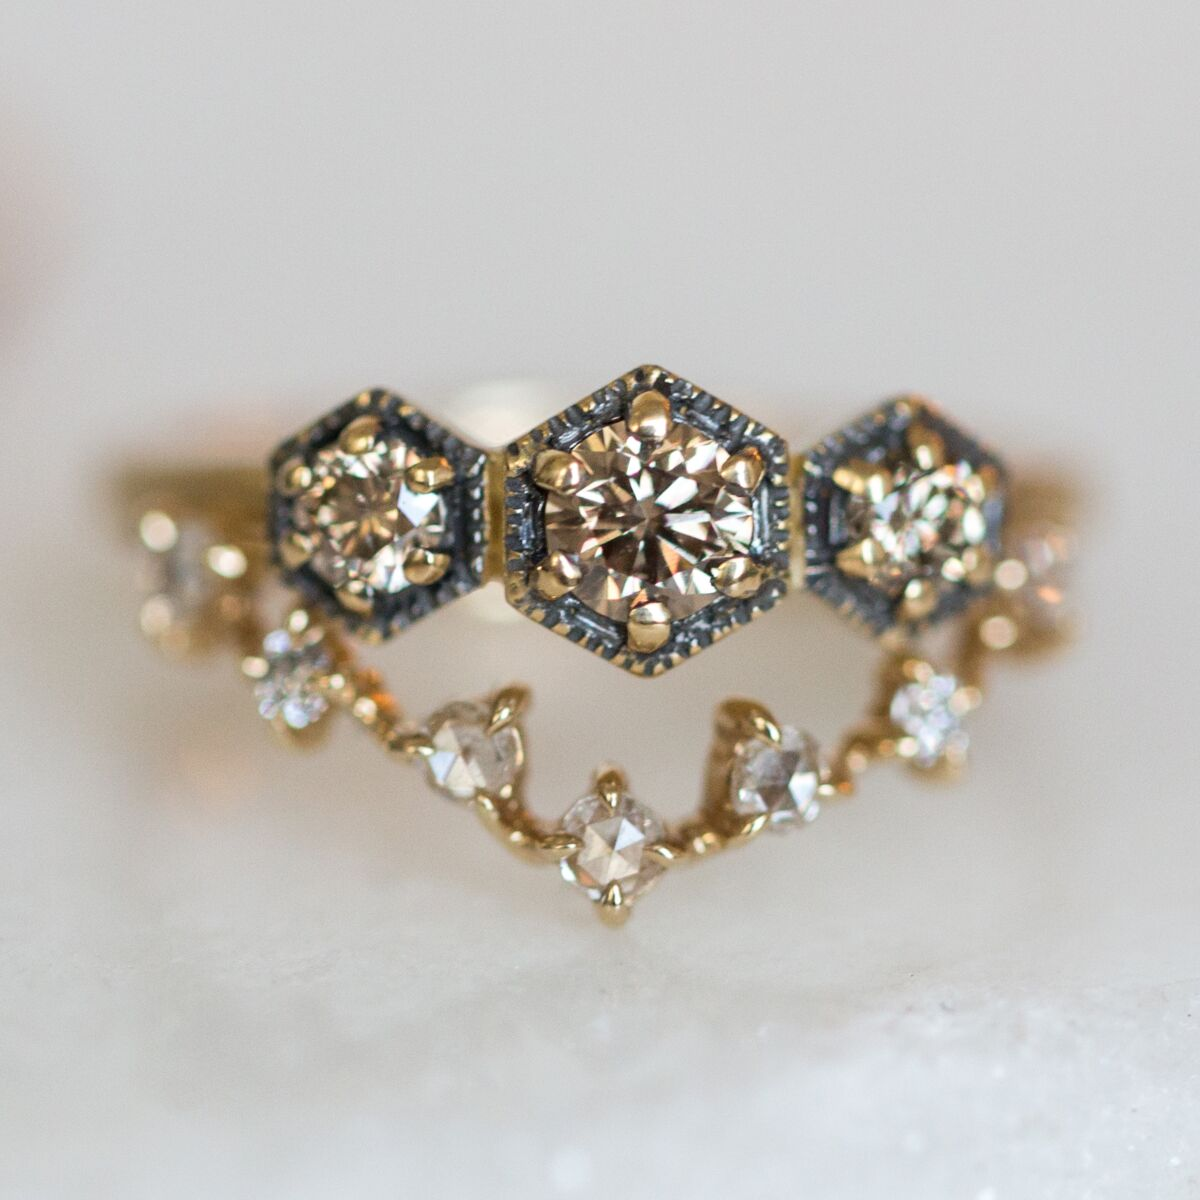 Triple Hexagon Ring, Champagne Diamond image